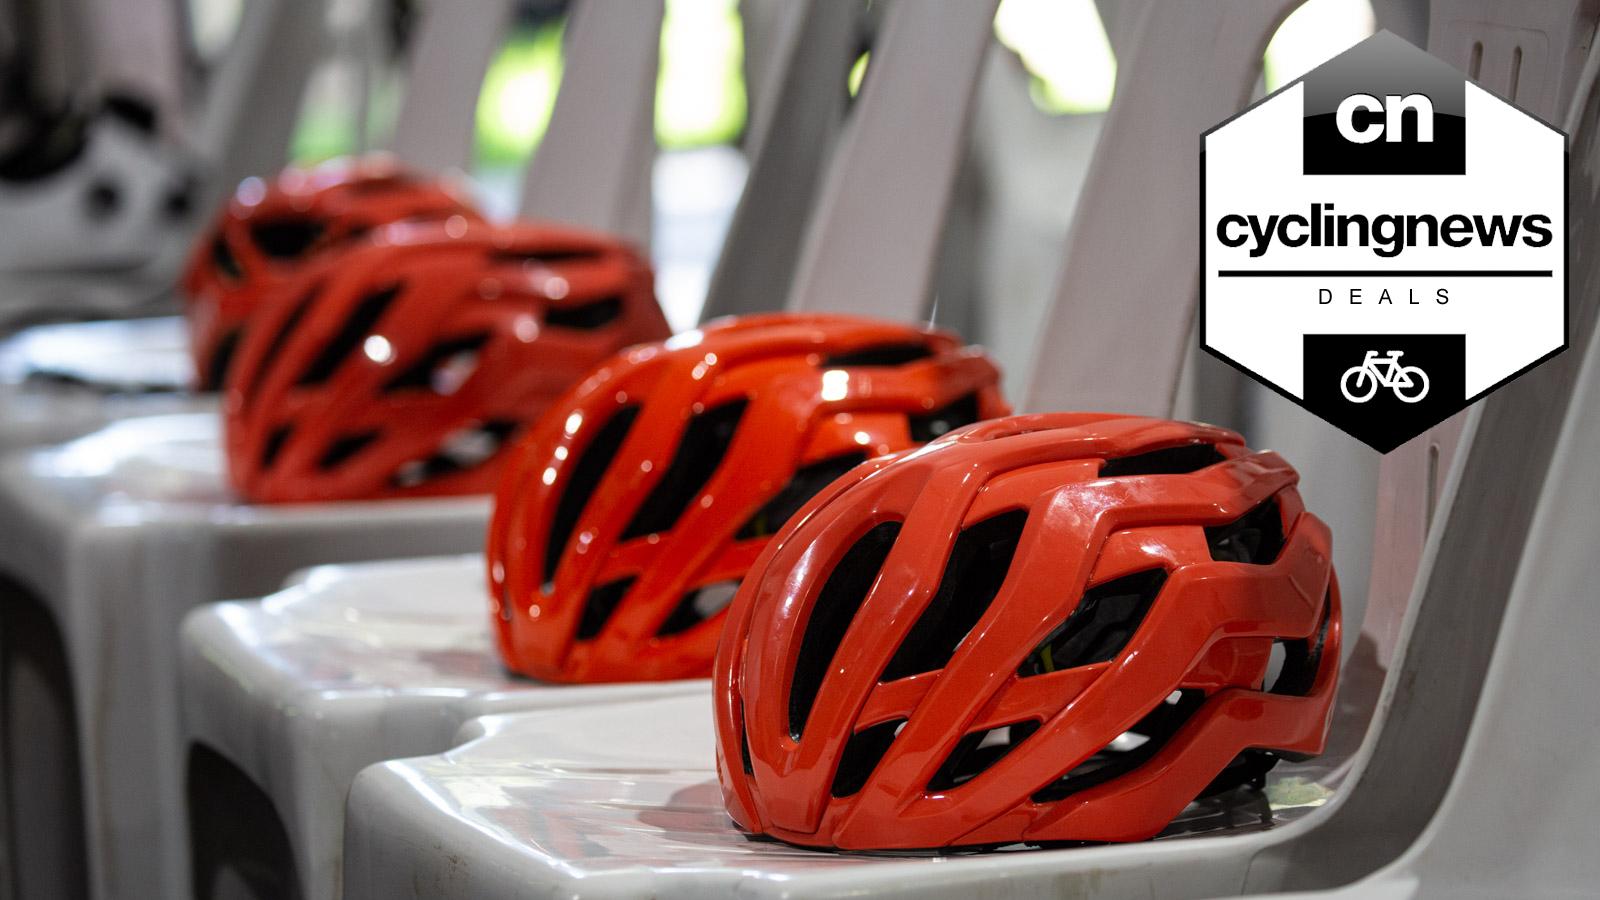 Adult Road Racing Helmet,Specialized Adult Bike Helmet Mountain Bike Helmet Shock Absorption for Better Head Protection